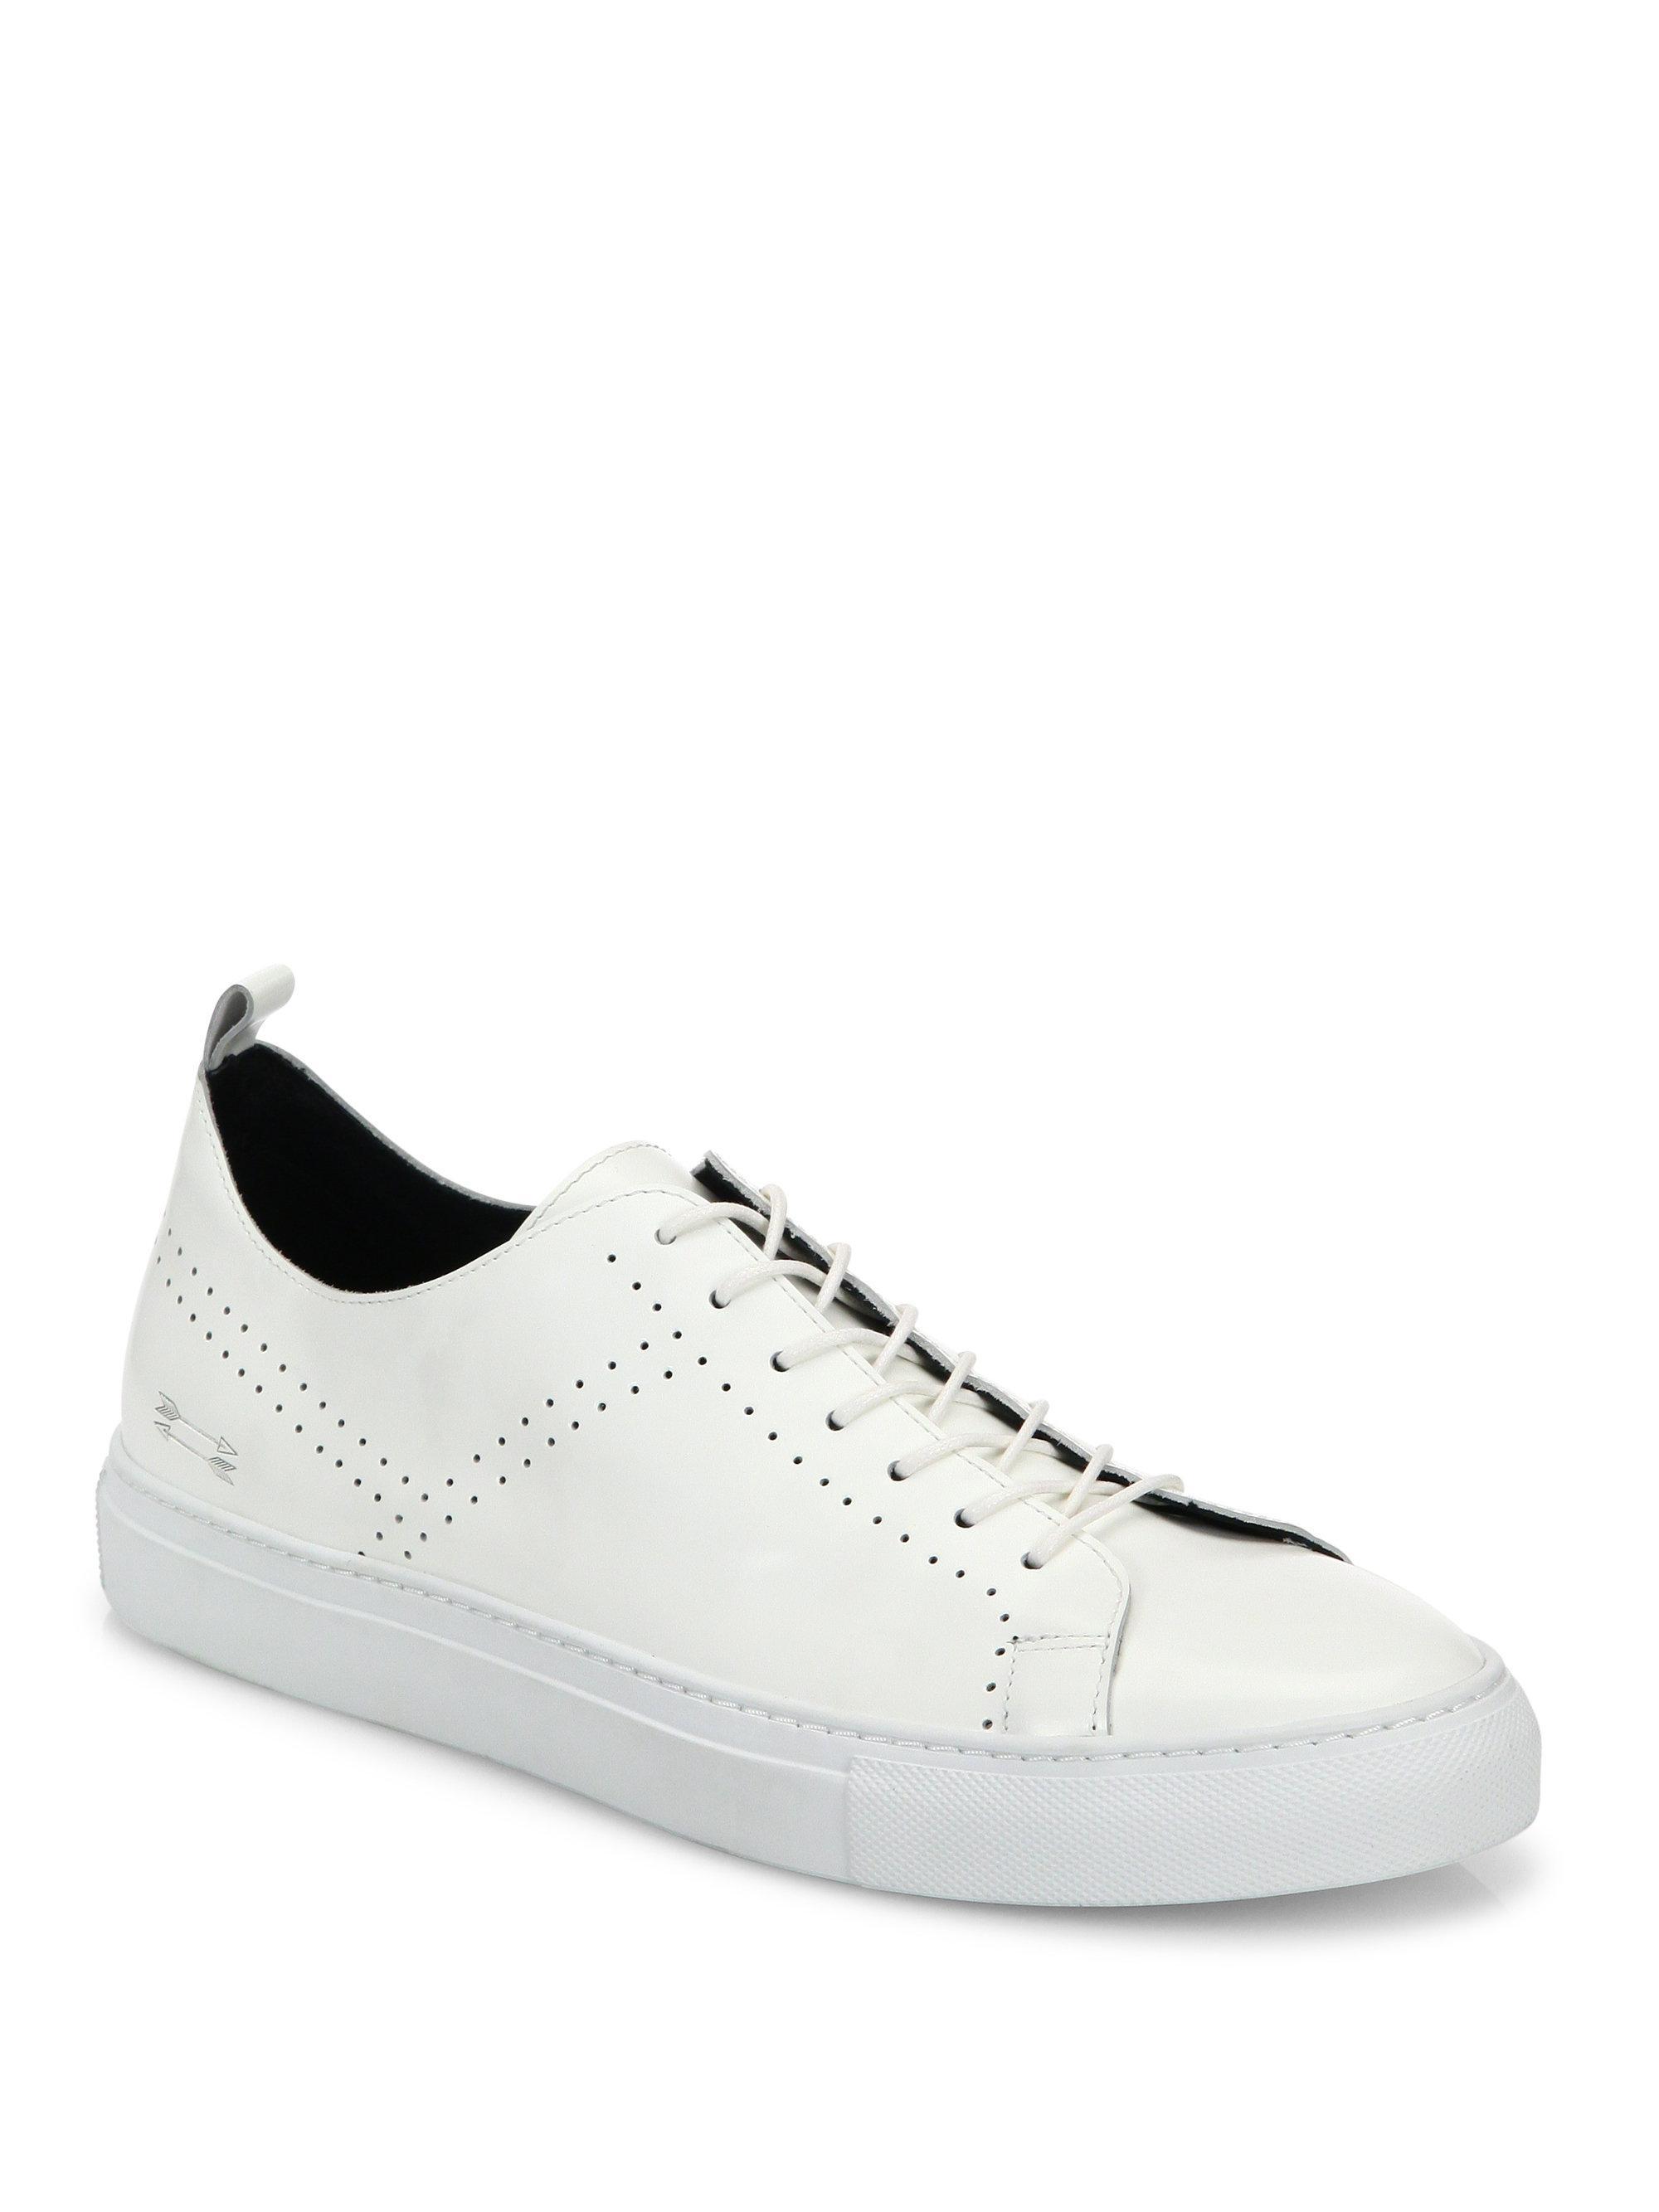 Uri Minkoff Soprano Leather Sneakers swppfd8x7z